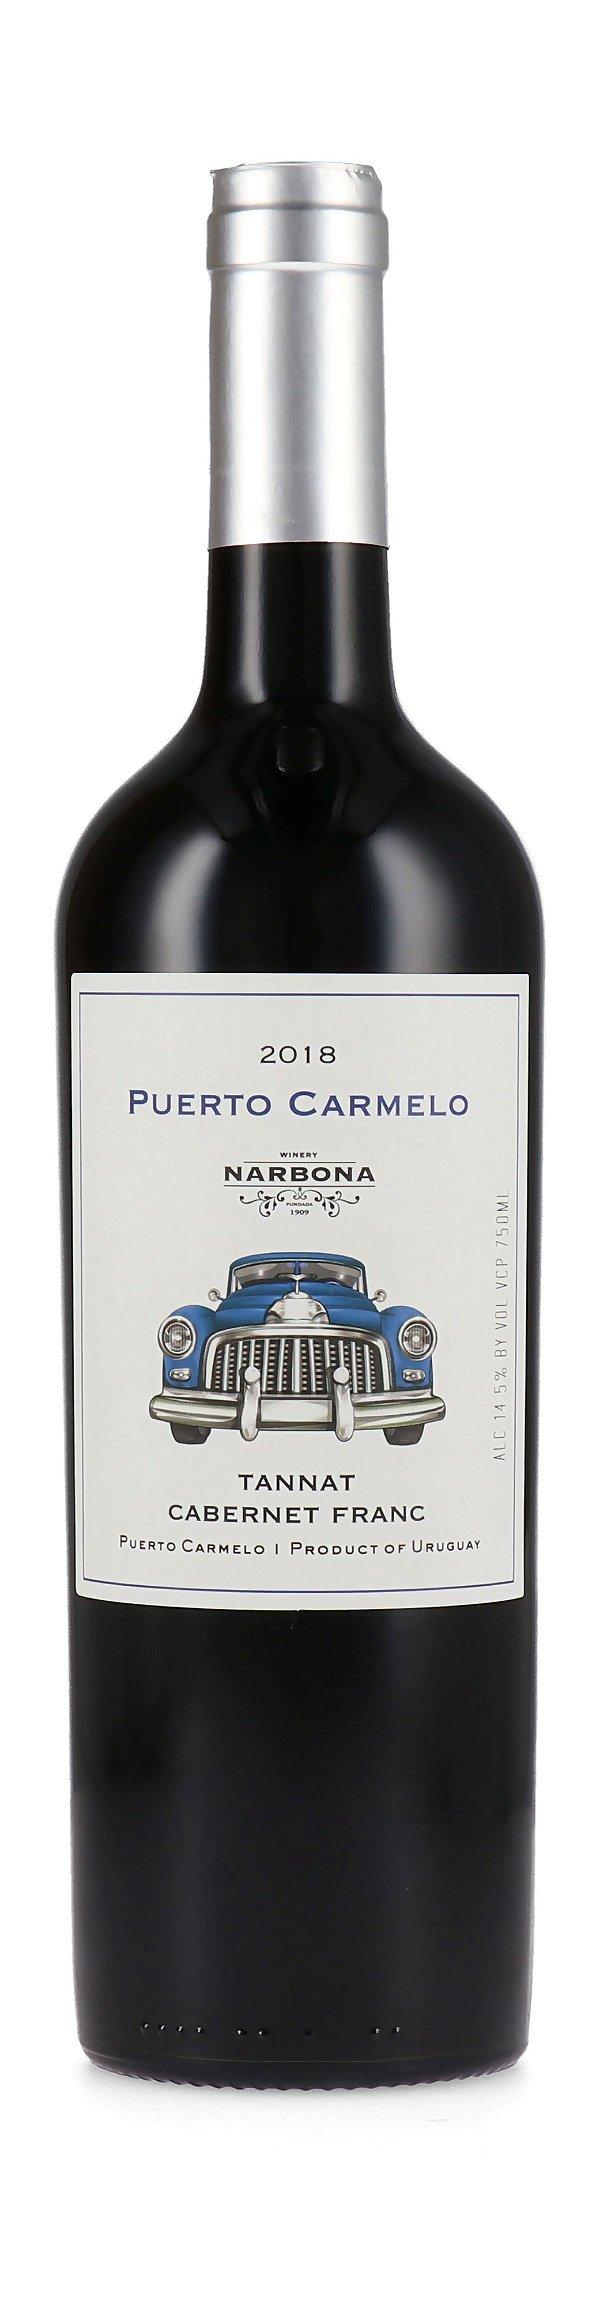 Vinho tinto Tannat Cabernet Franc Puerto Carmelo